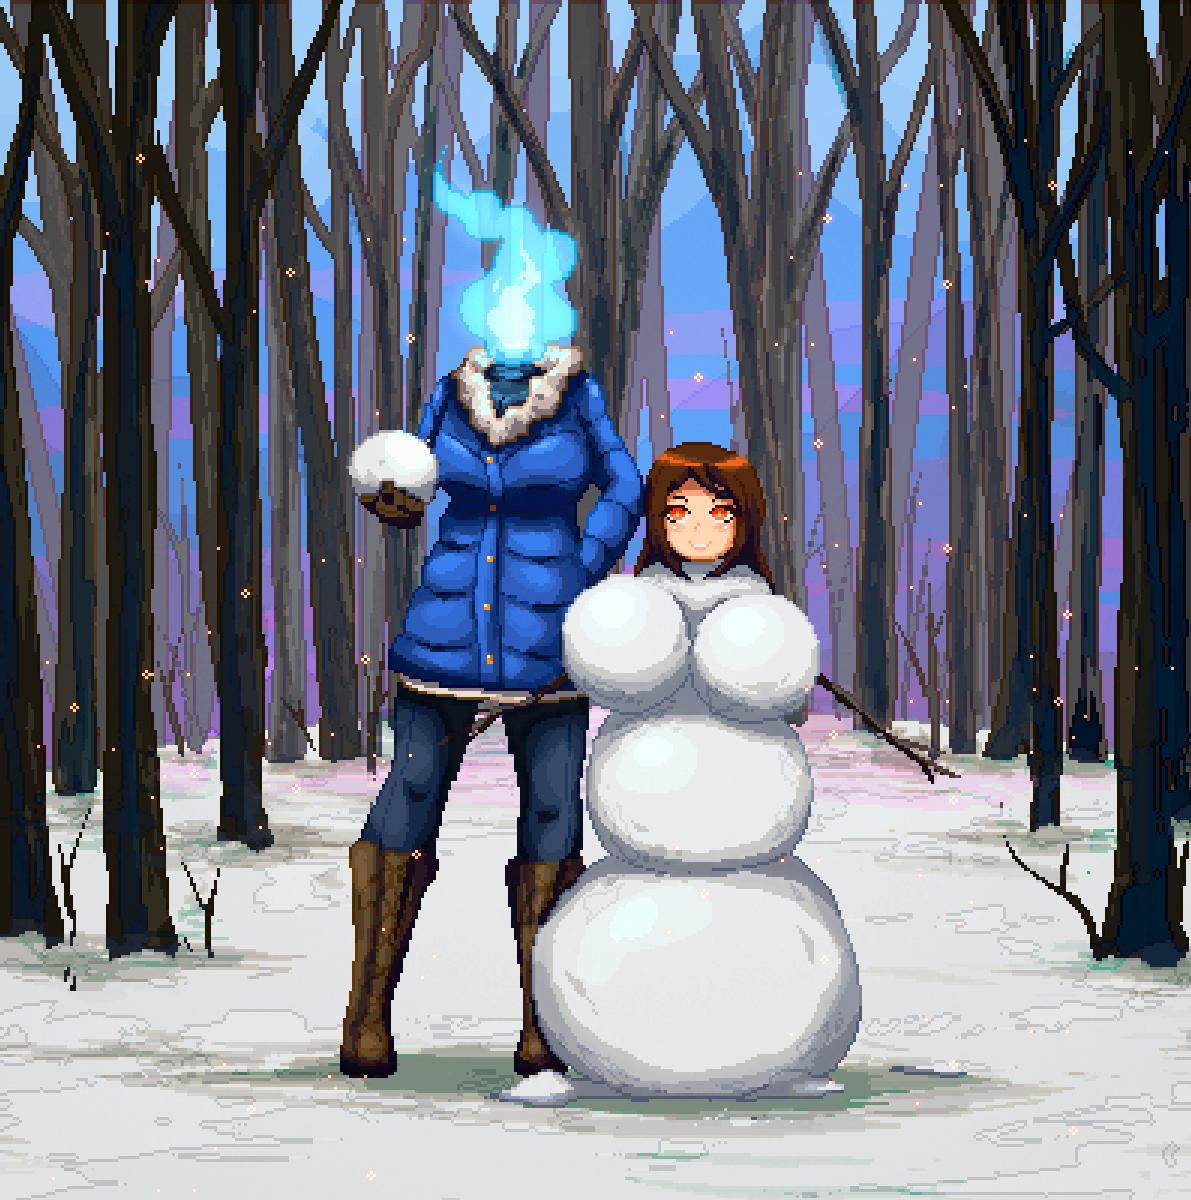 Mairona, Snow day